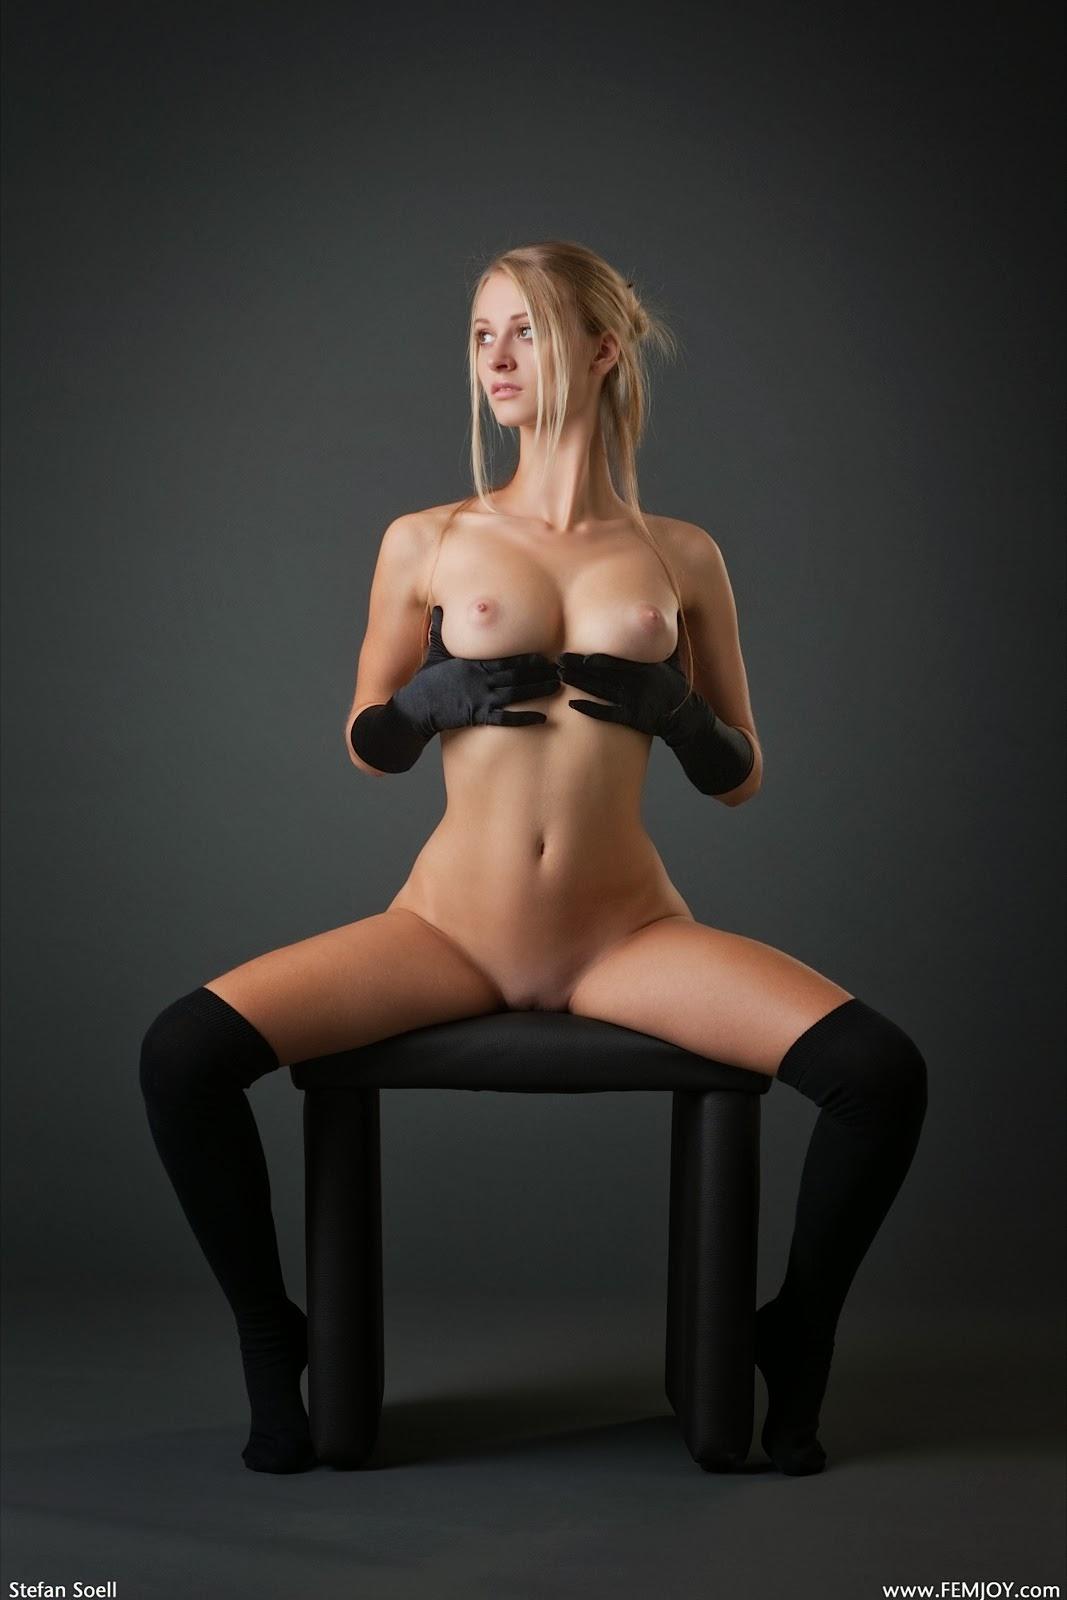 Chicas Desnudas En Baracaldo 6715